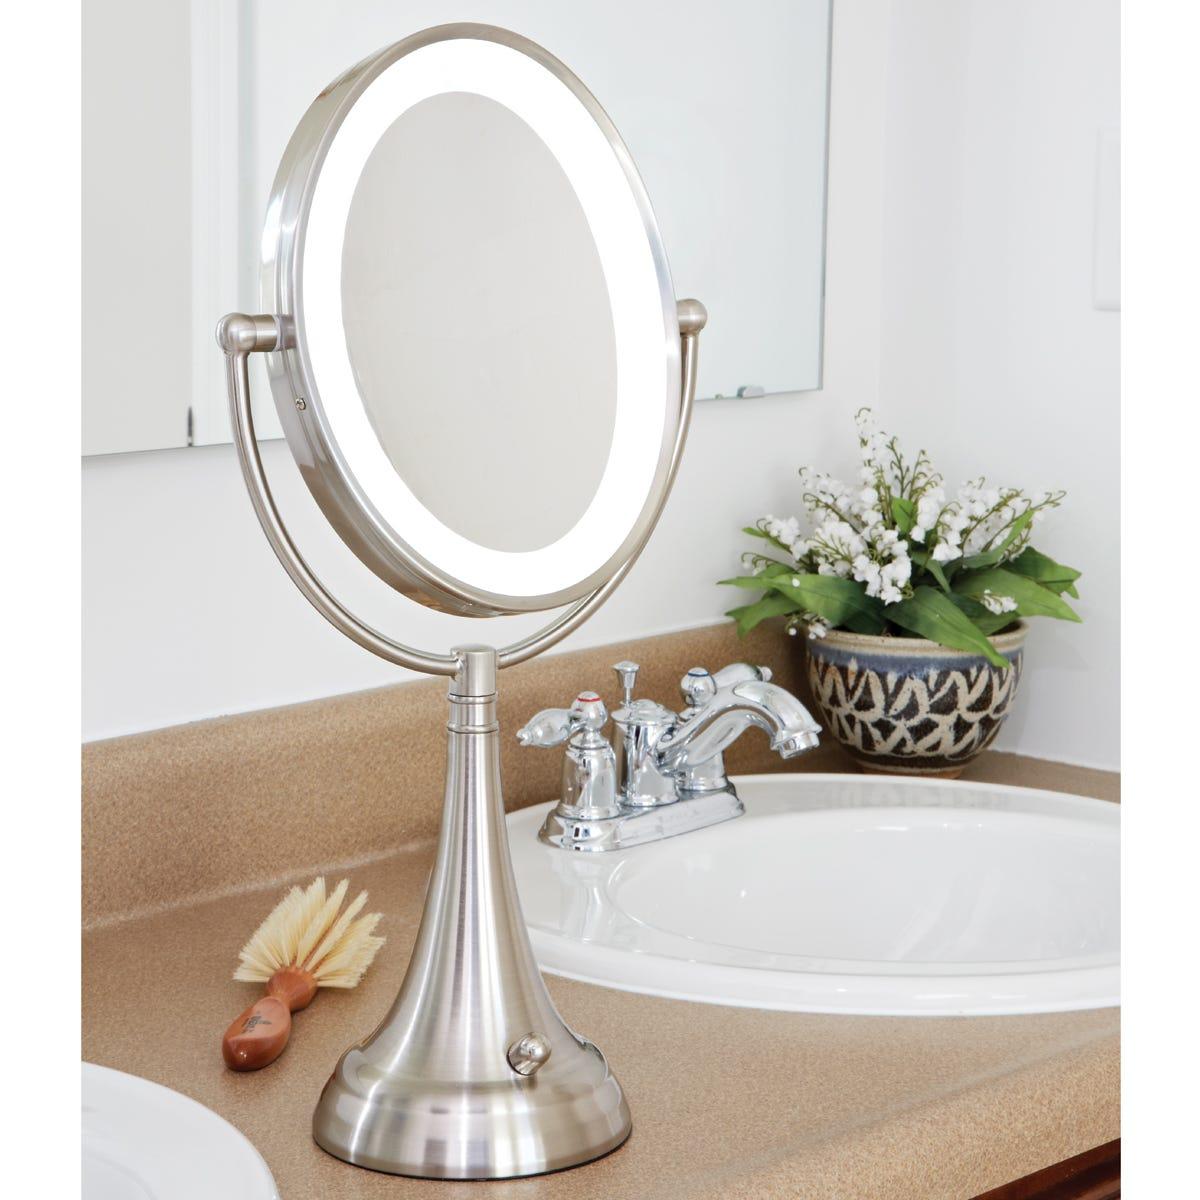 Lighted Vanity Mirror.Cordless Lighted Vanity Mirror